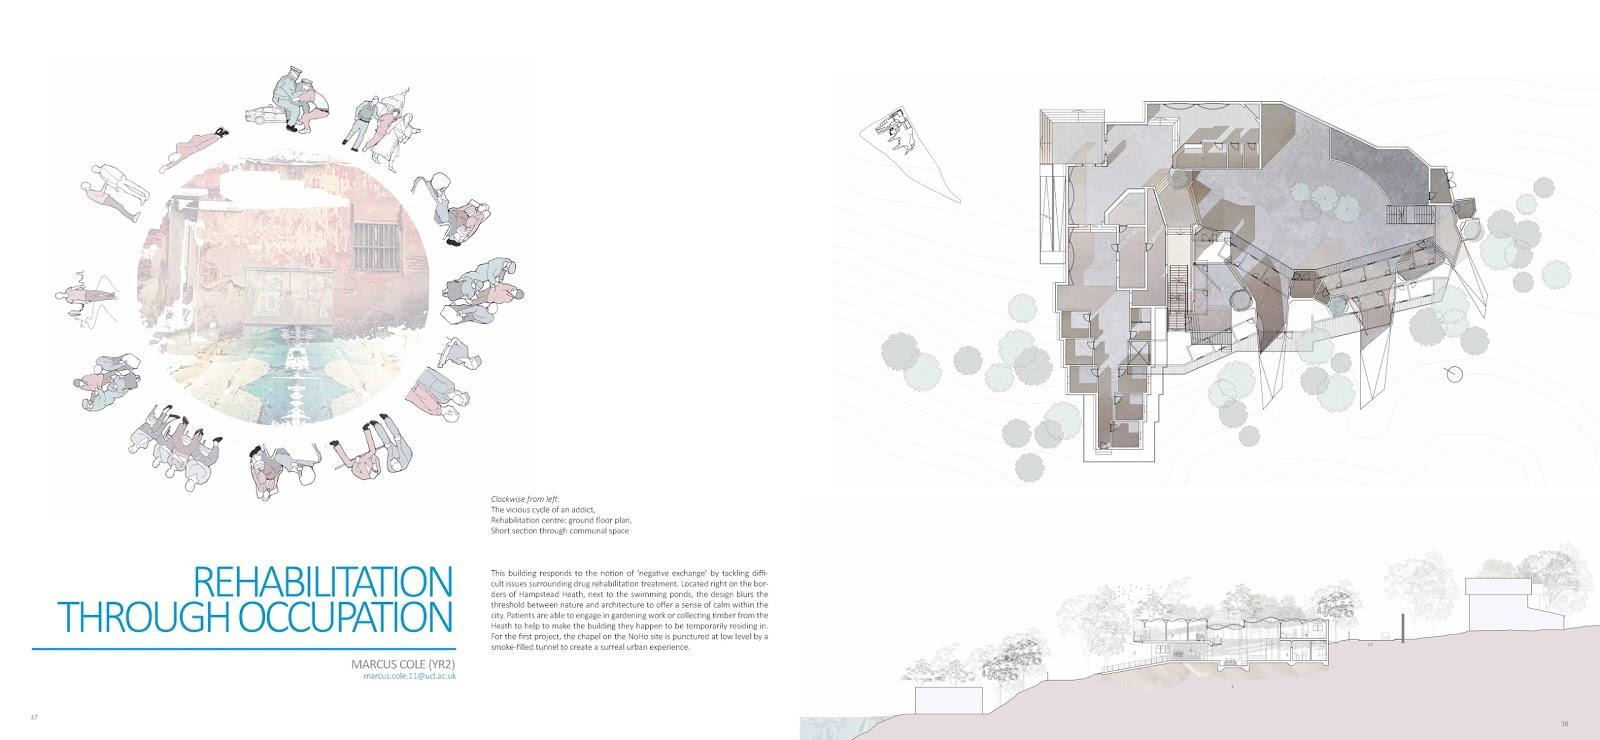 unit 0 bartlett of architecture ucl rehabilitation